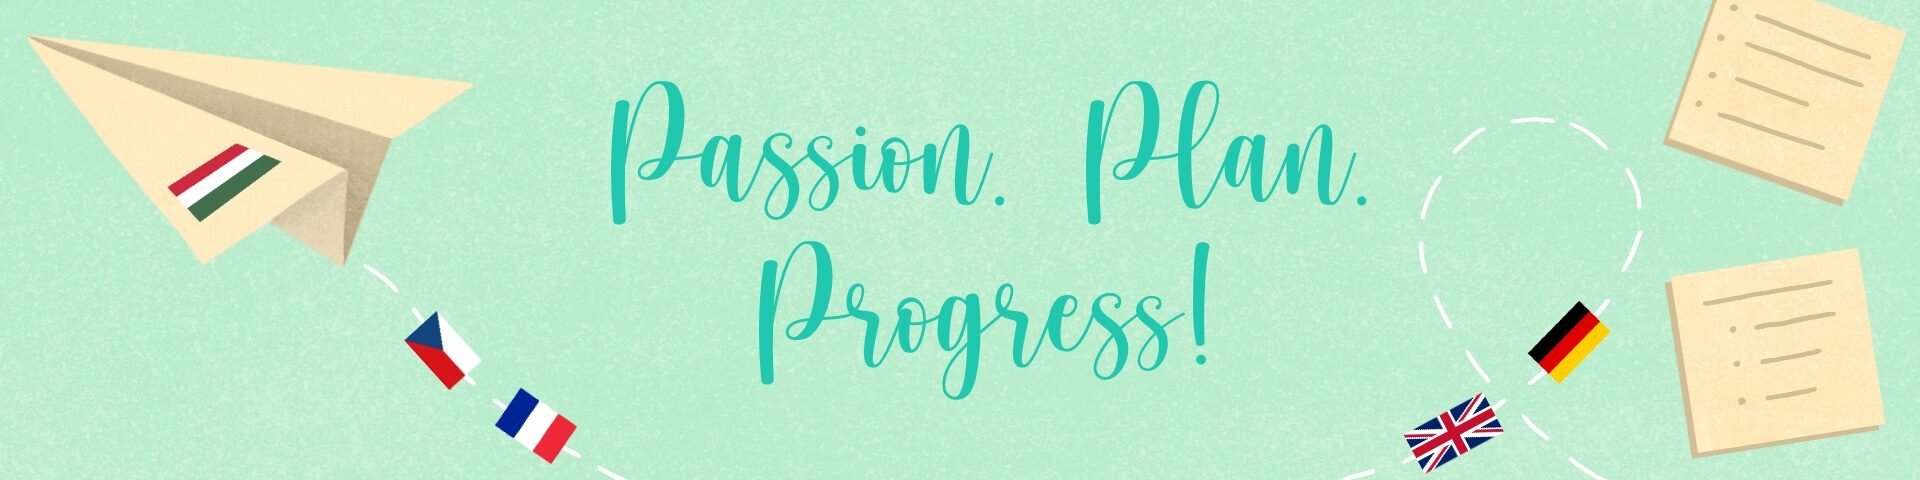 Passion. Plan. Progress!